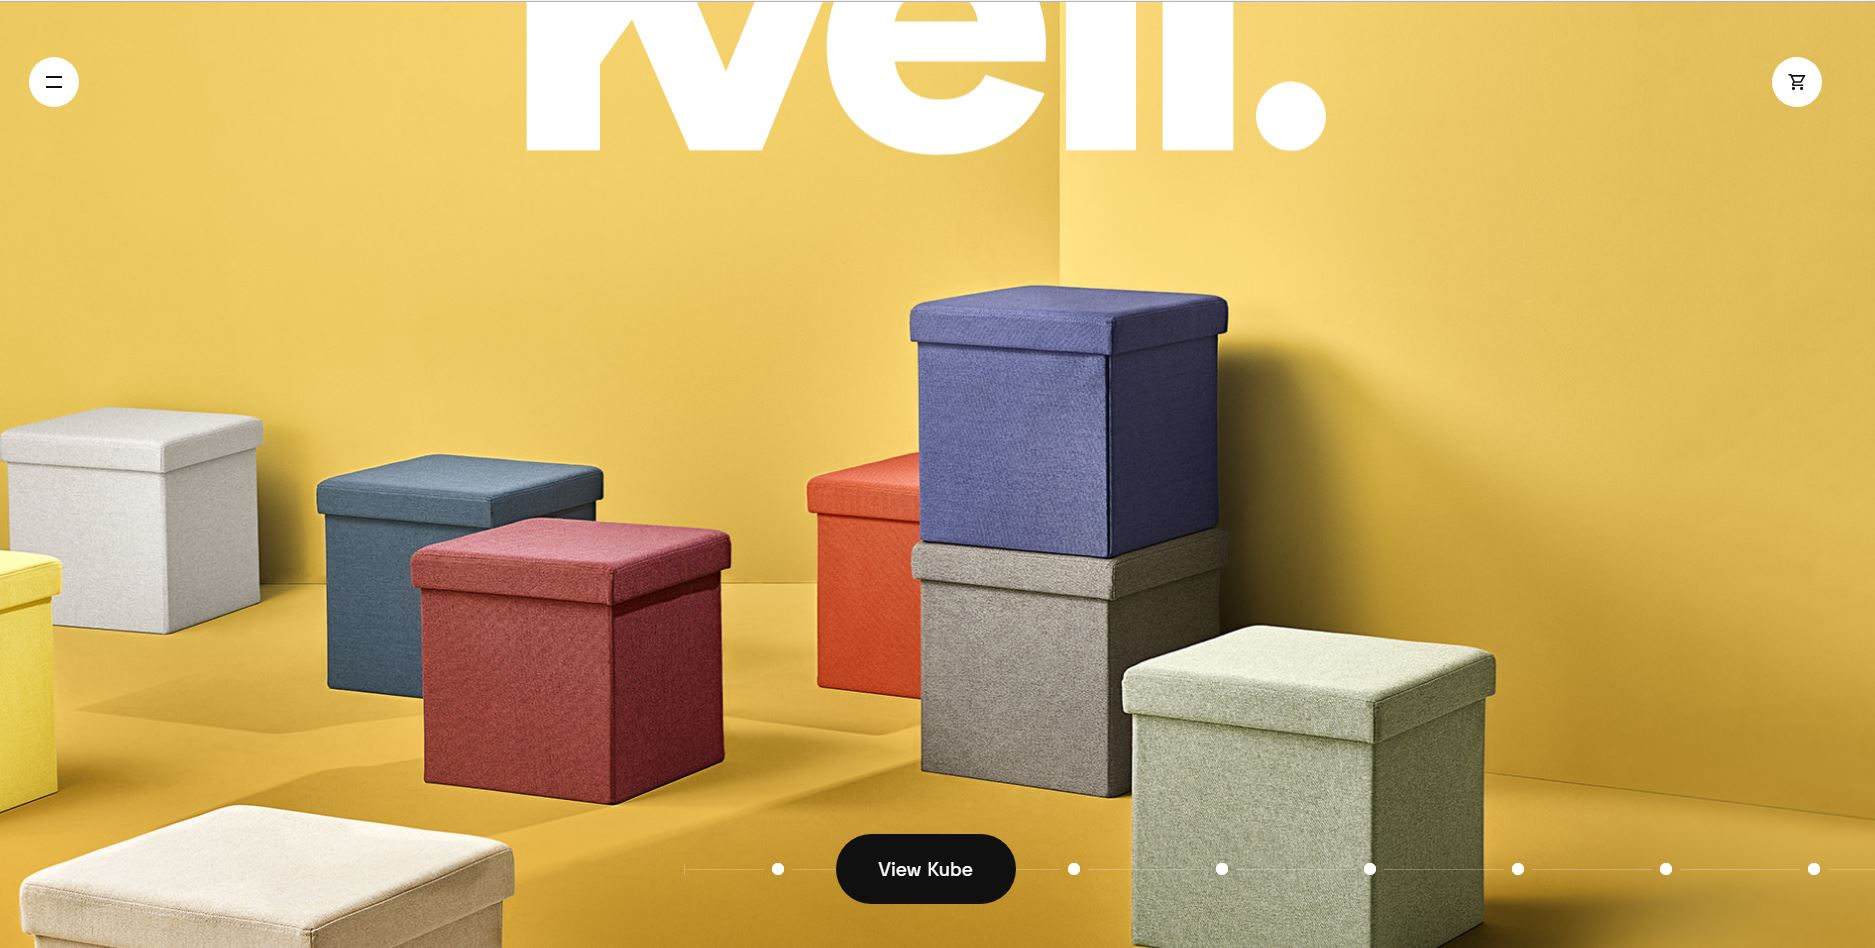 kvell: beste webshops